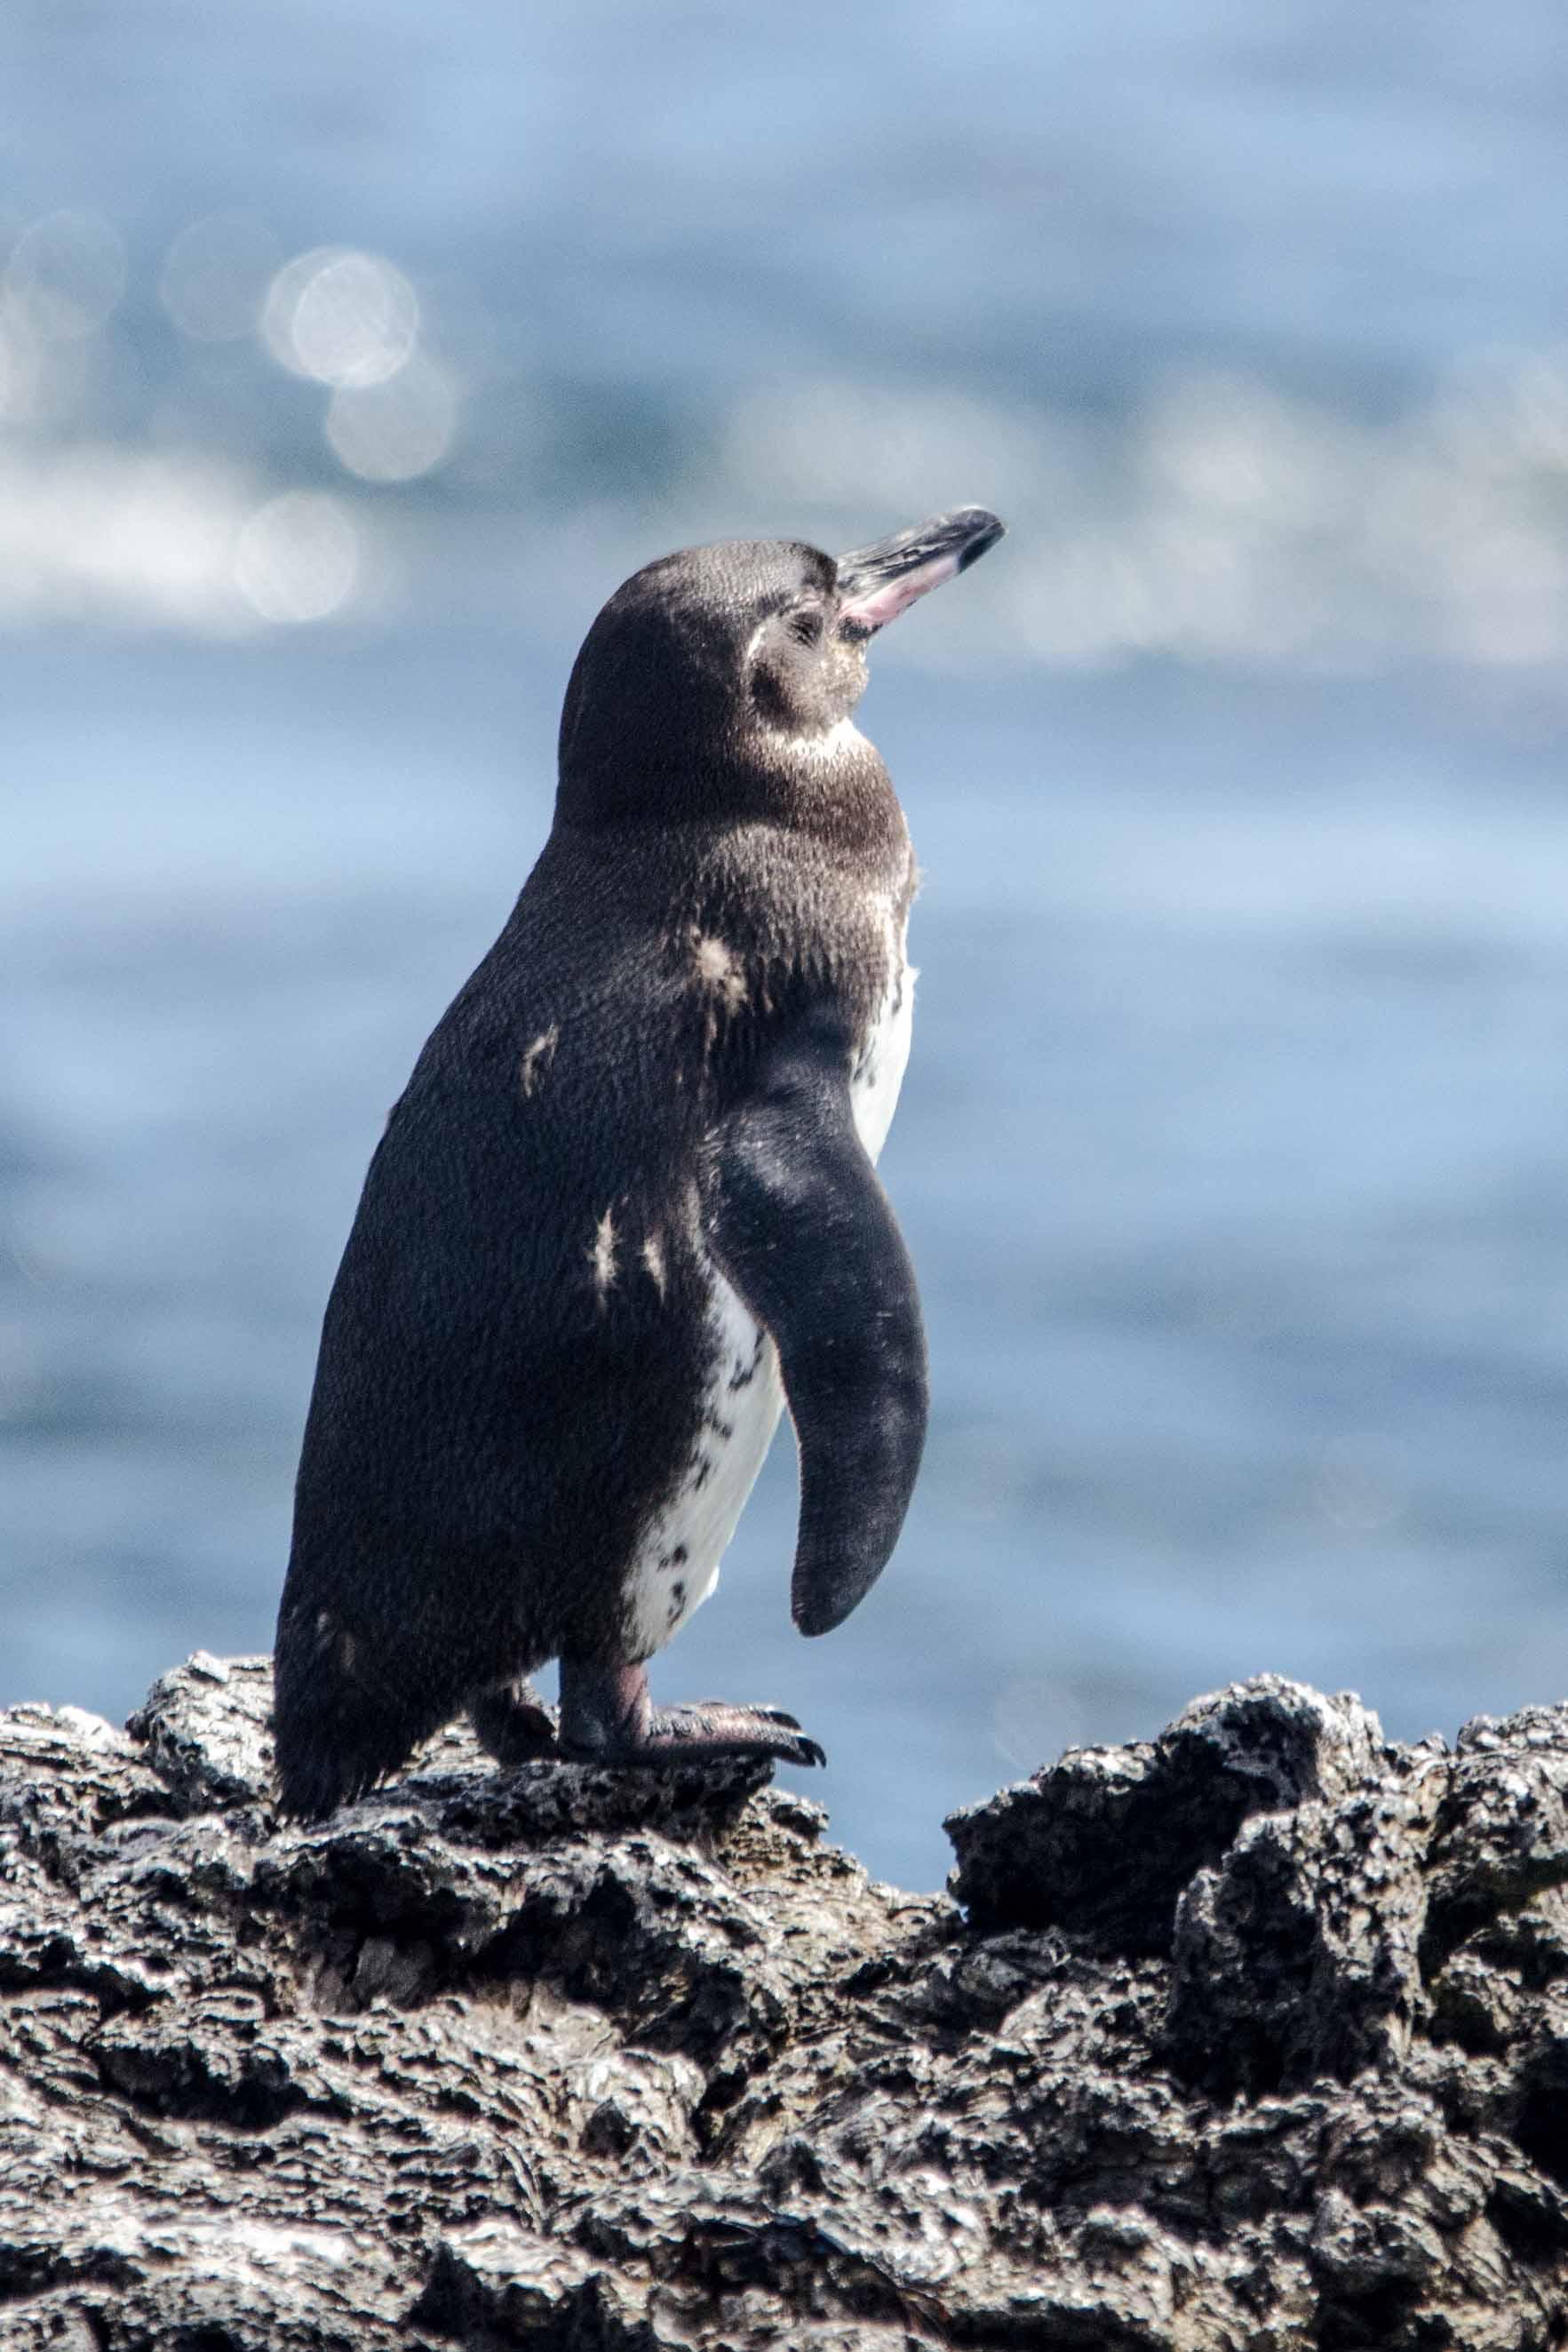 Galapagos Penguin, Isabela Island, The Galapagos, Ecuador | ©Angela Drake / Not Your Average American